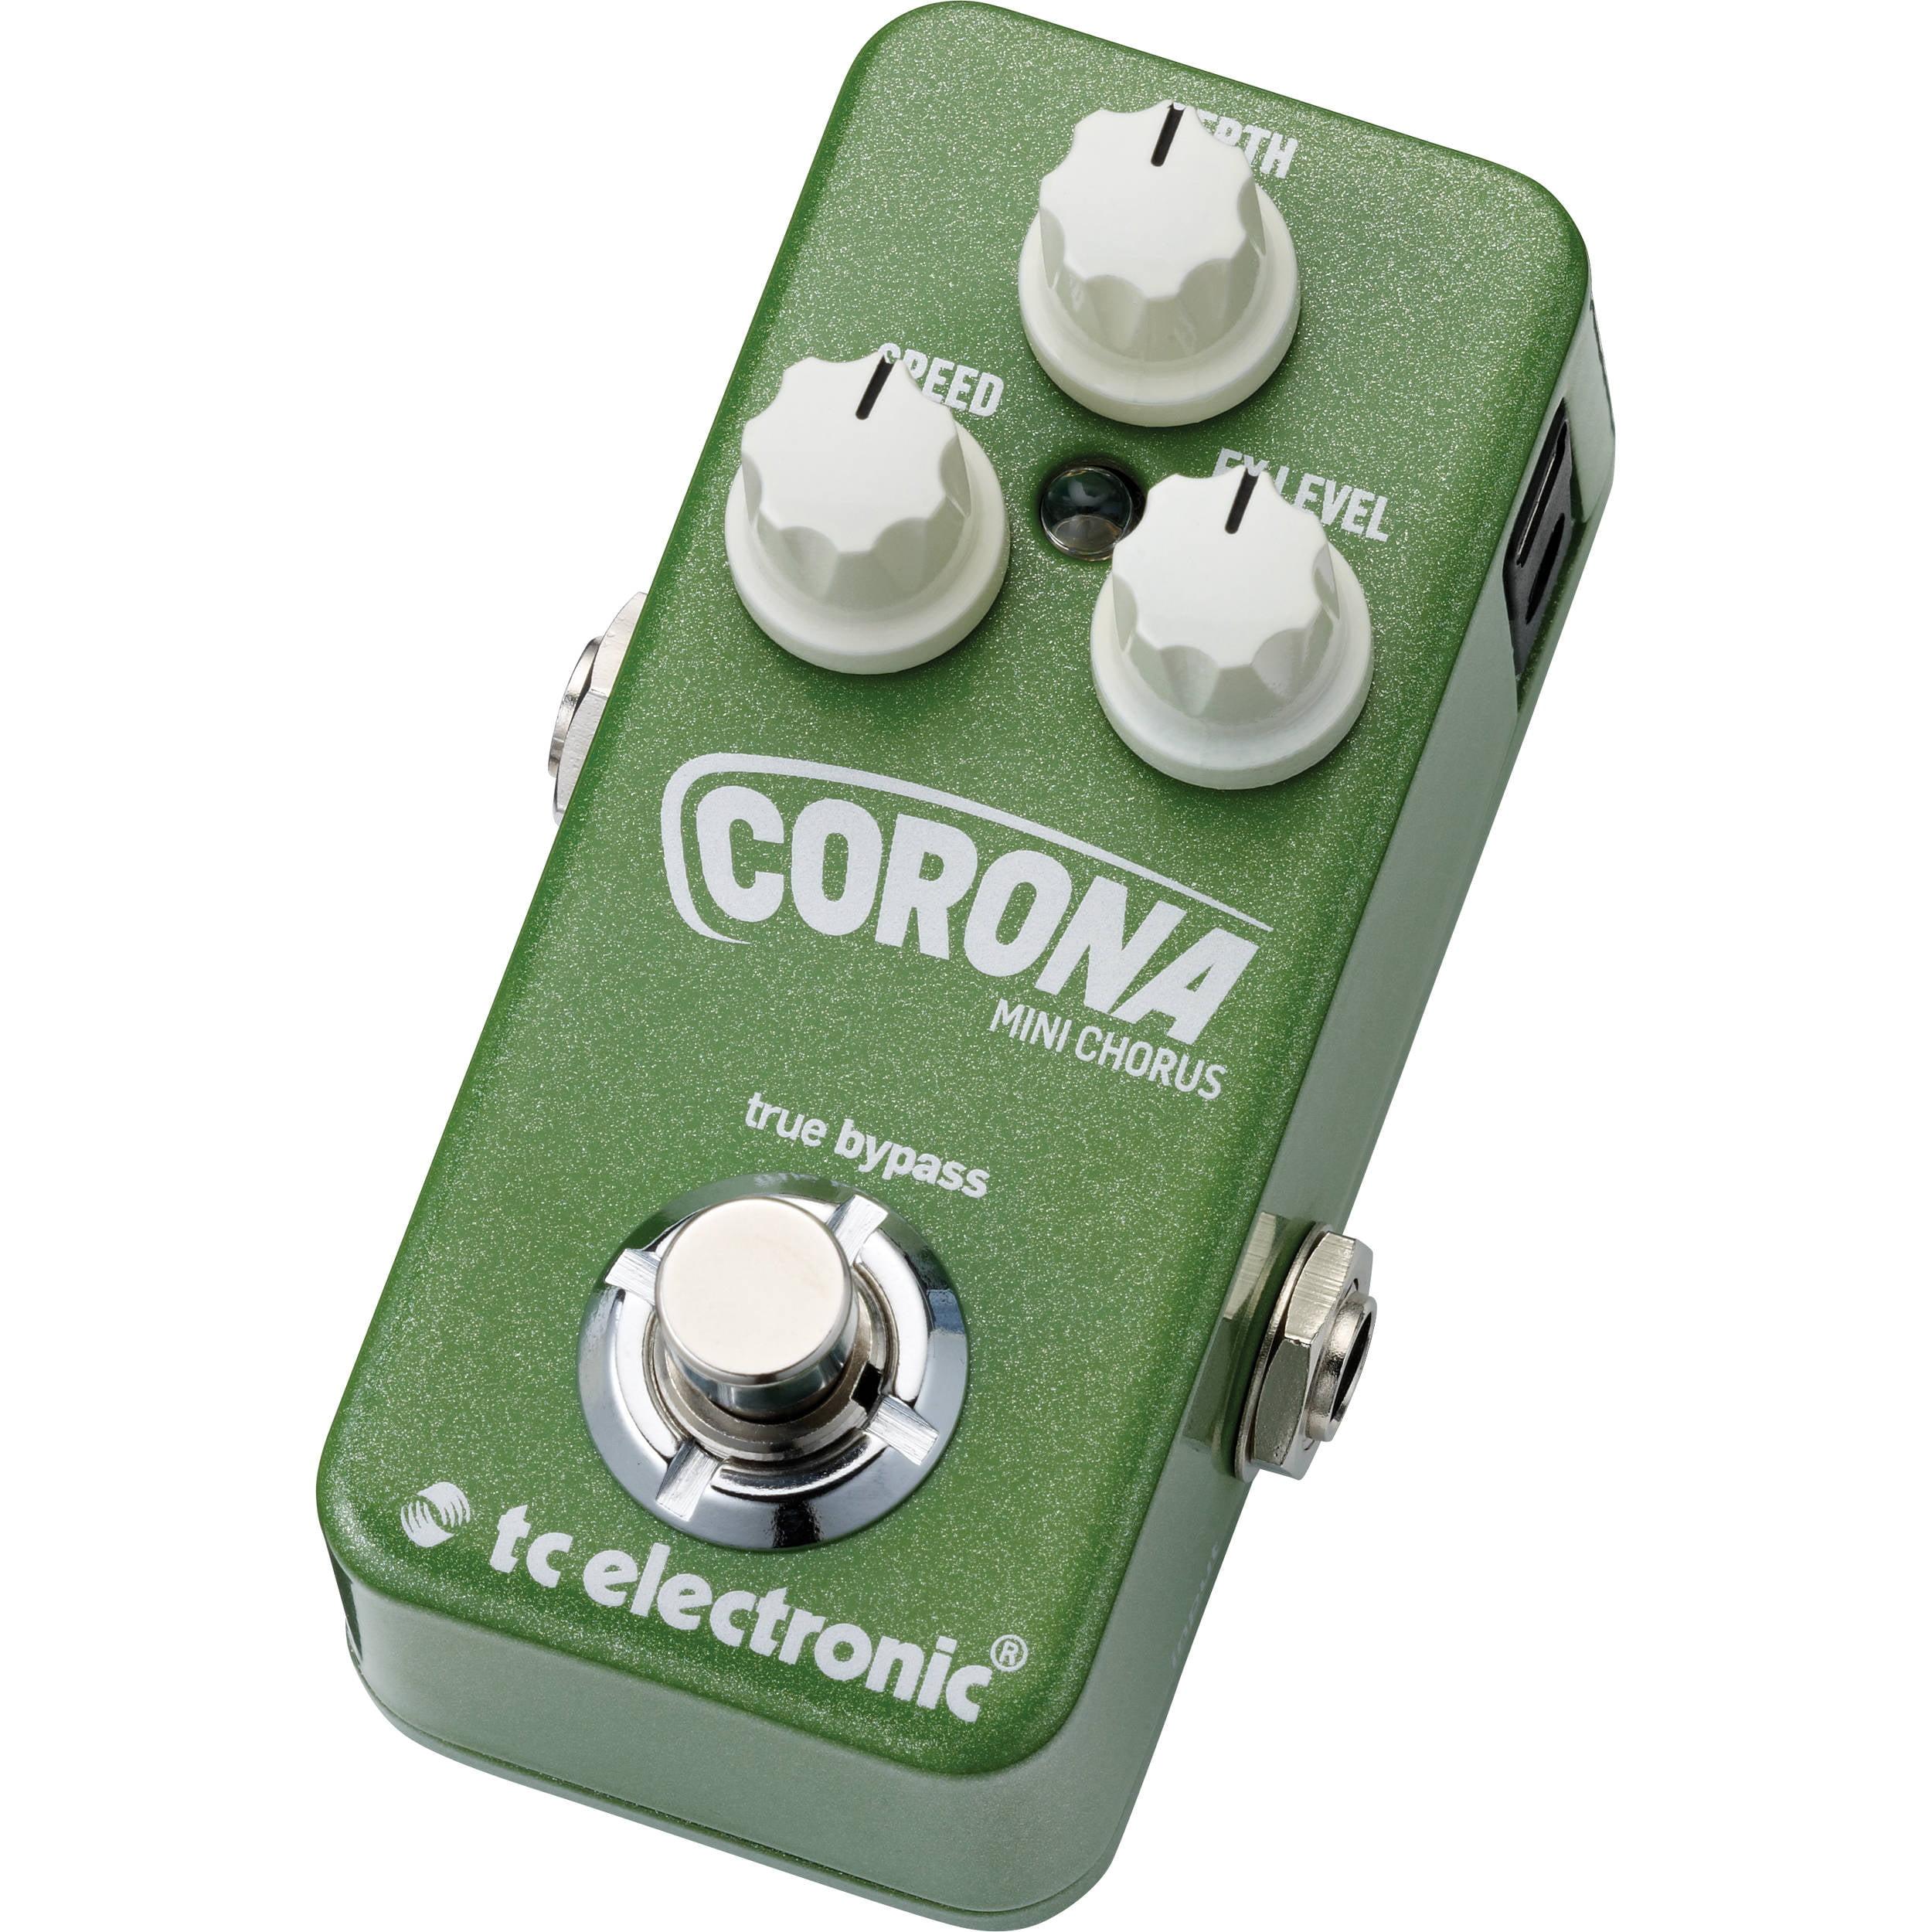 TC Electronic Corona Mini Chorus Guitar Effects Pedal 960807001 by TC Electronic